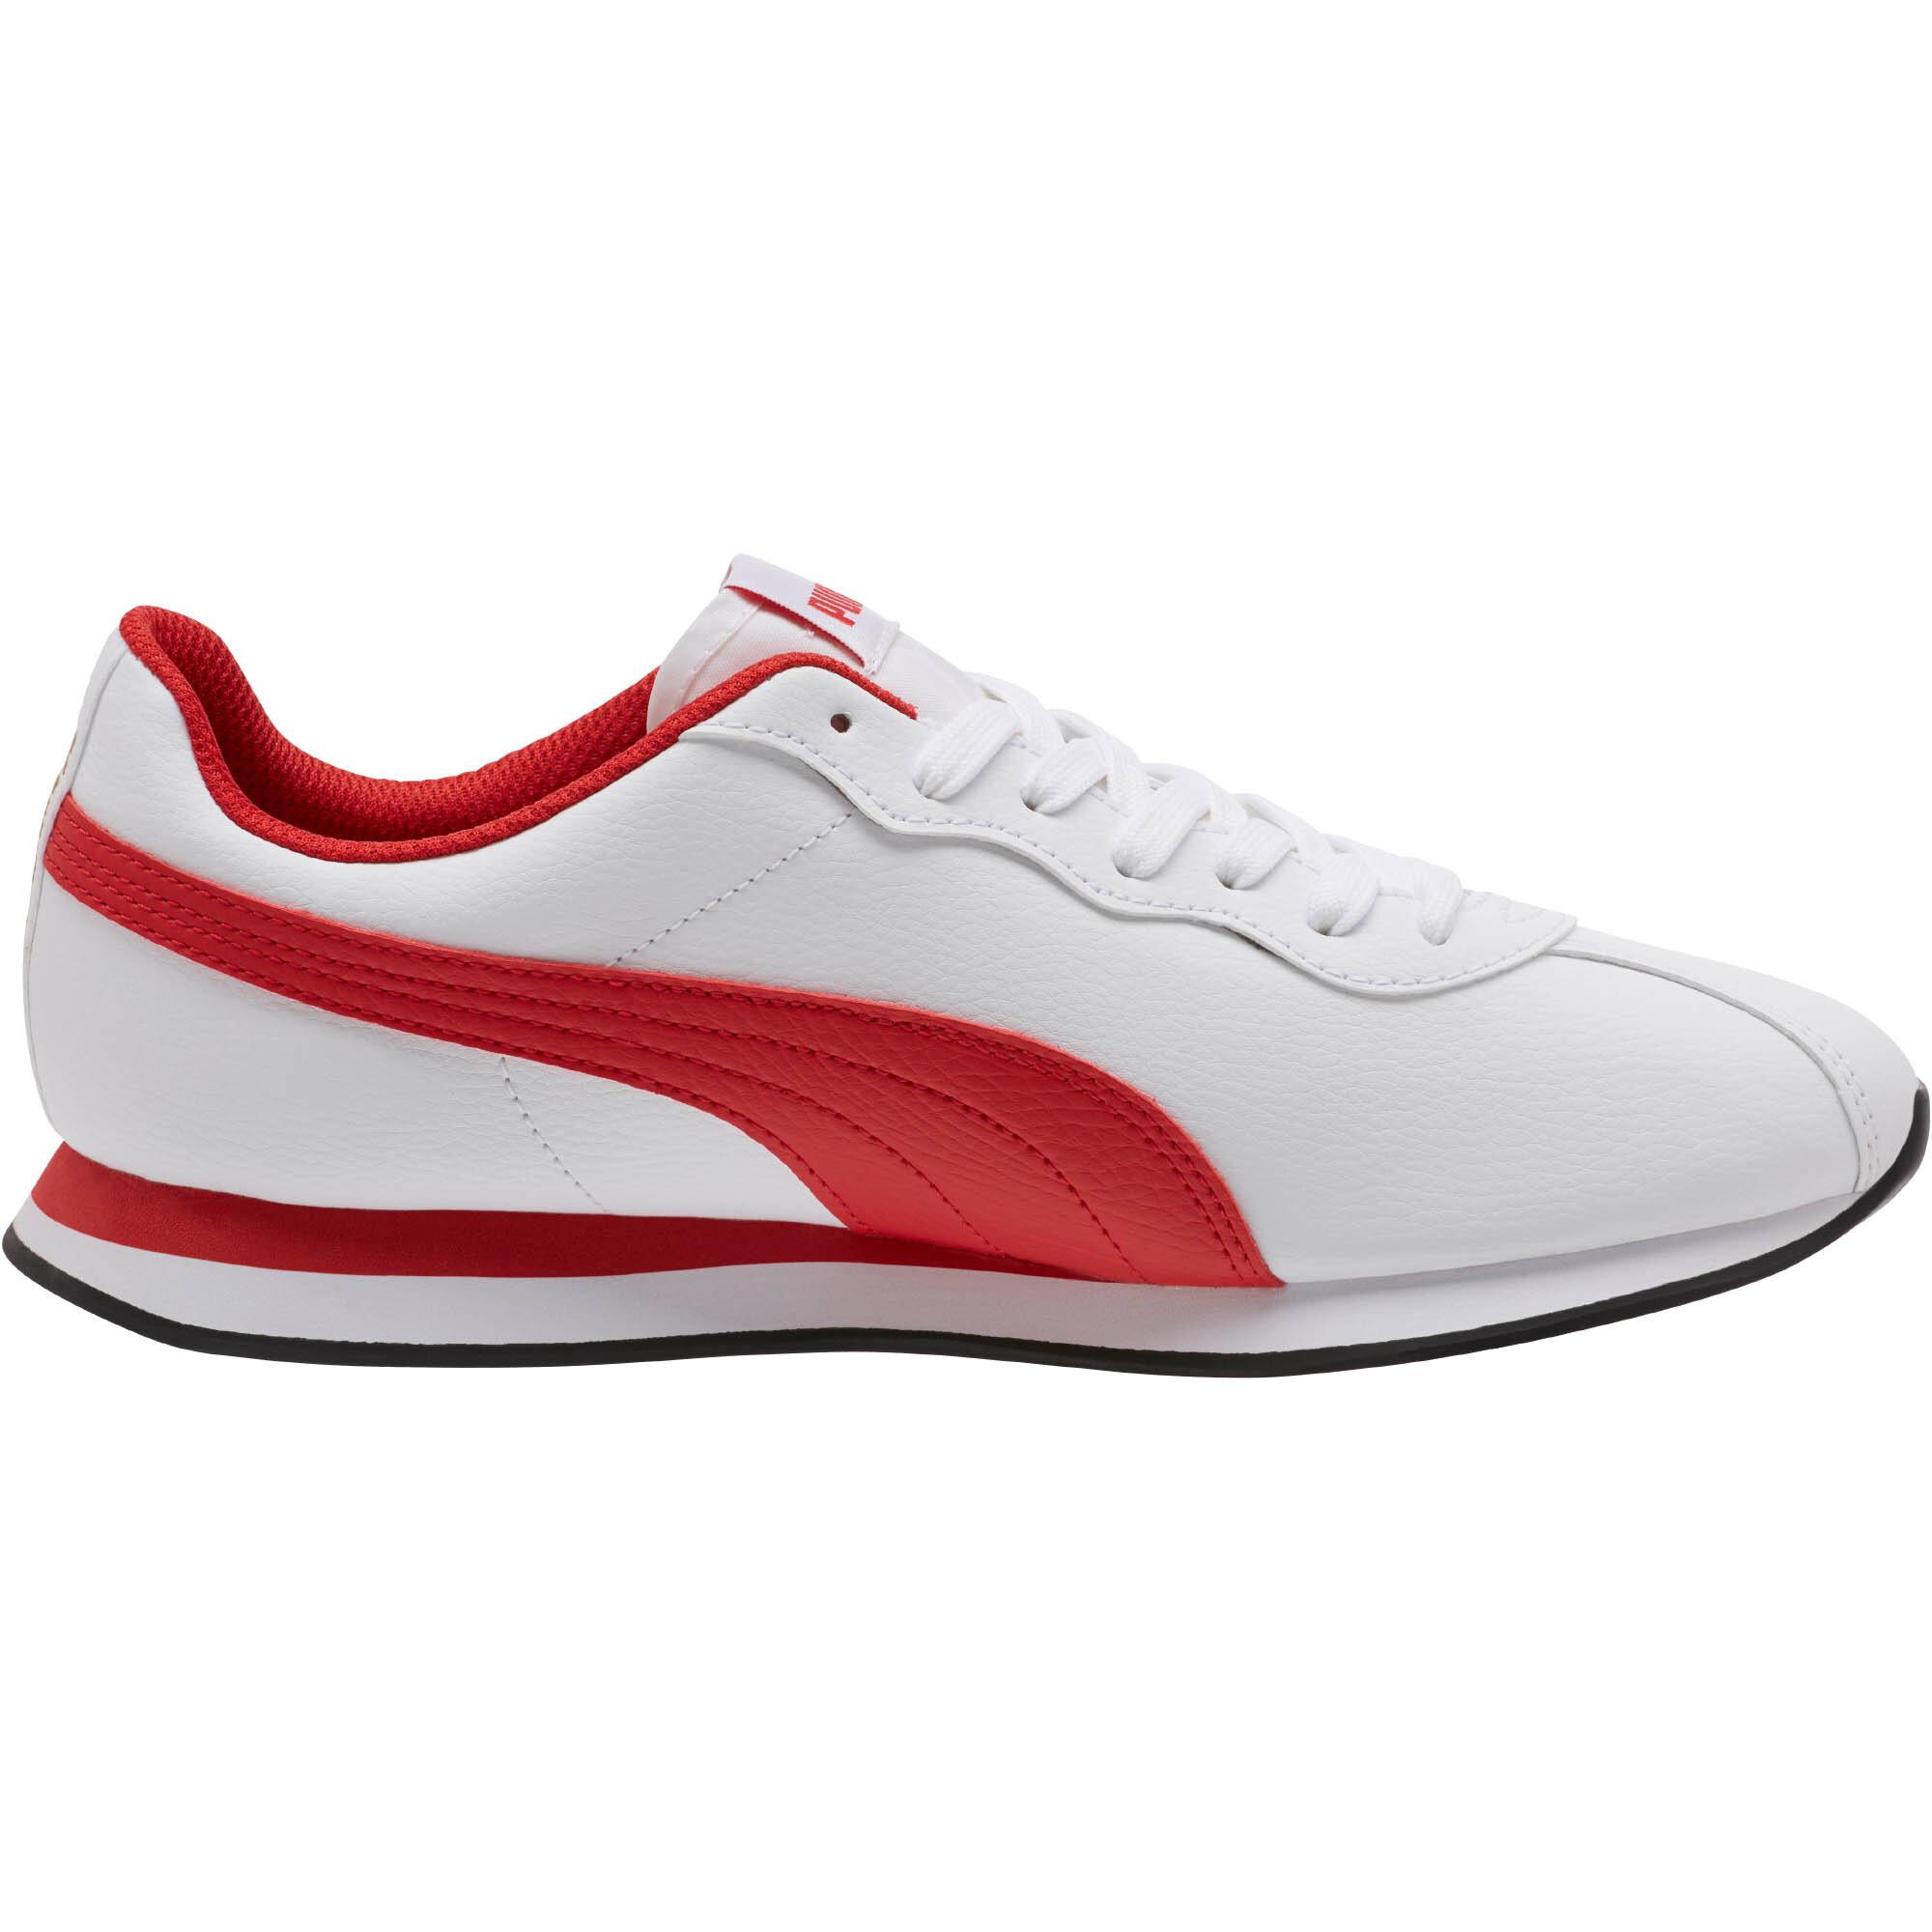 PUMA-Men-039-s-Turin-II-Sneakers thumbnail 33